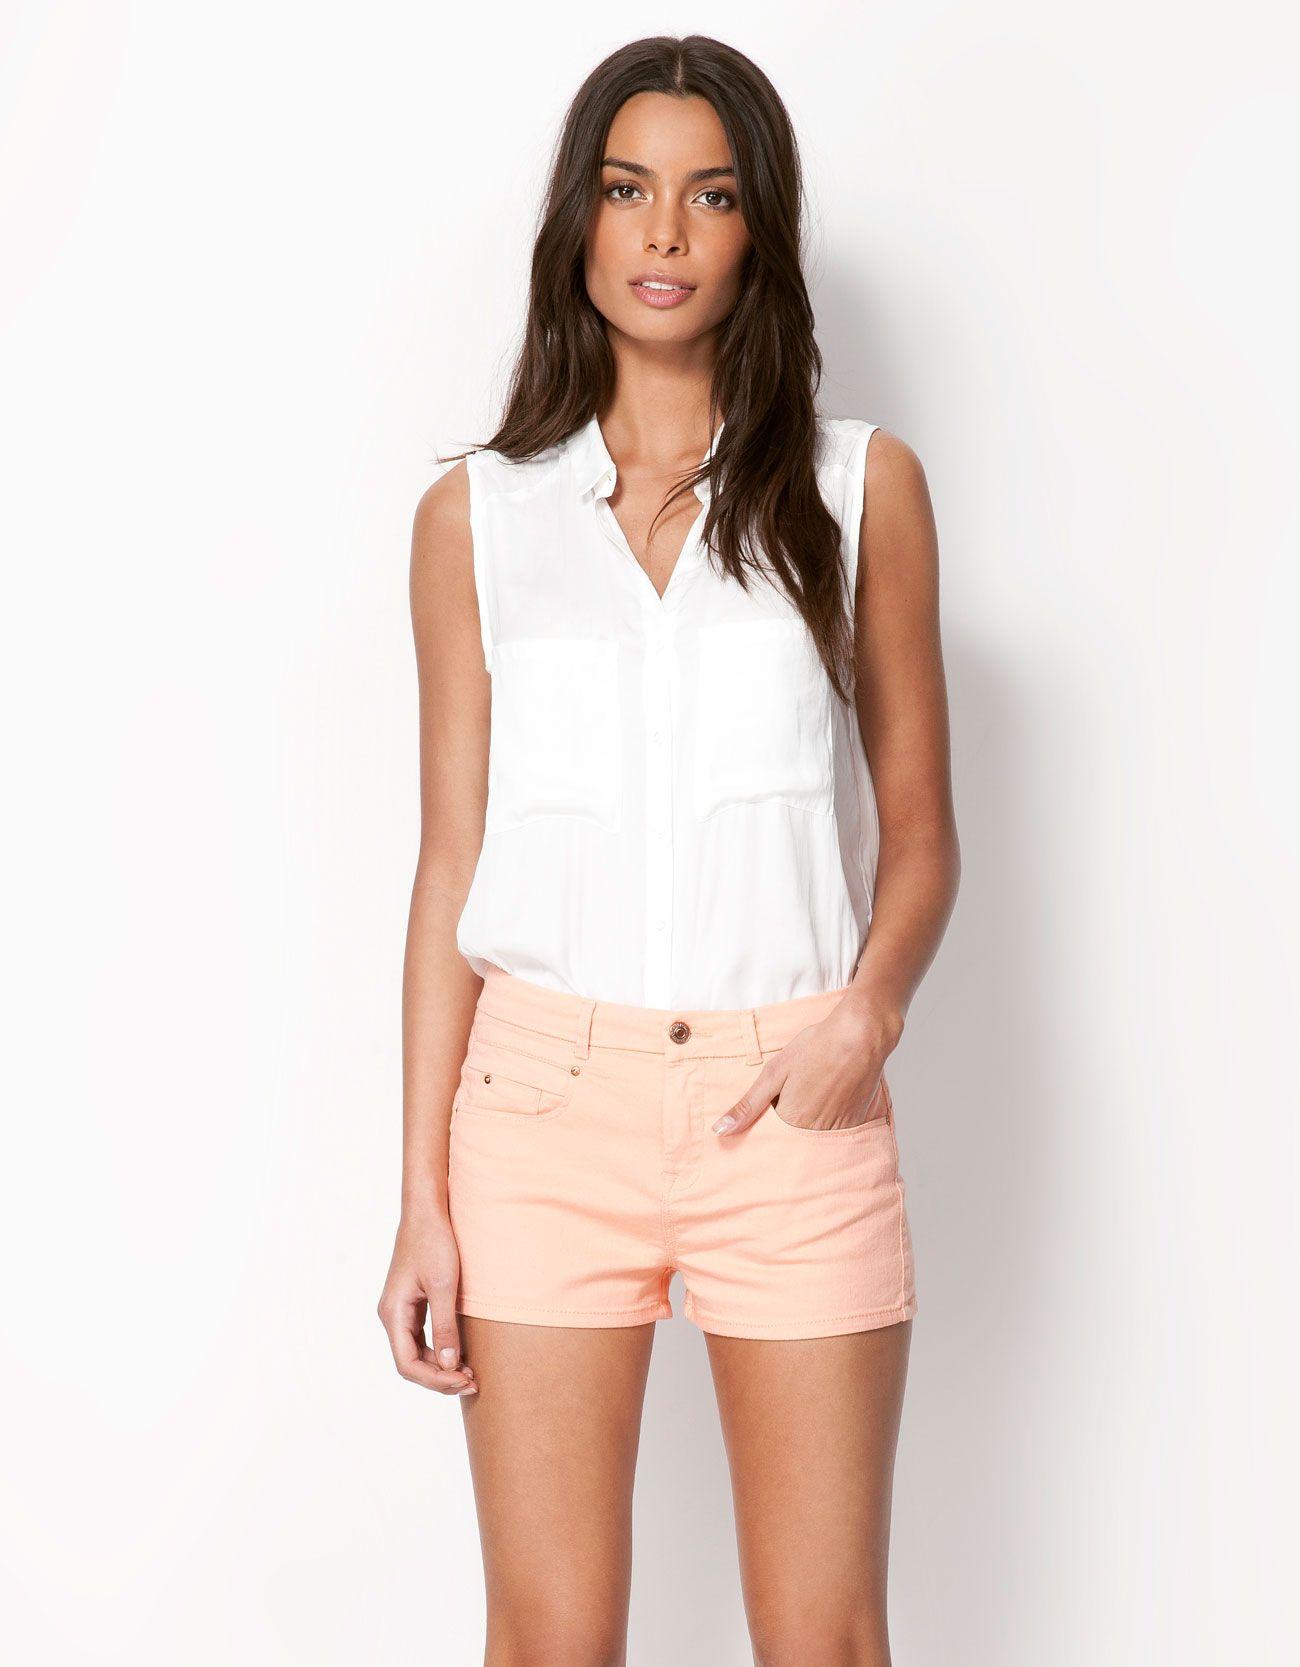 ba7ece1c3252 Bershka Lebanon - Bershka knotted shirt | Clothes & Shoes ...